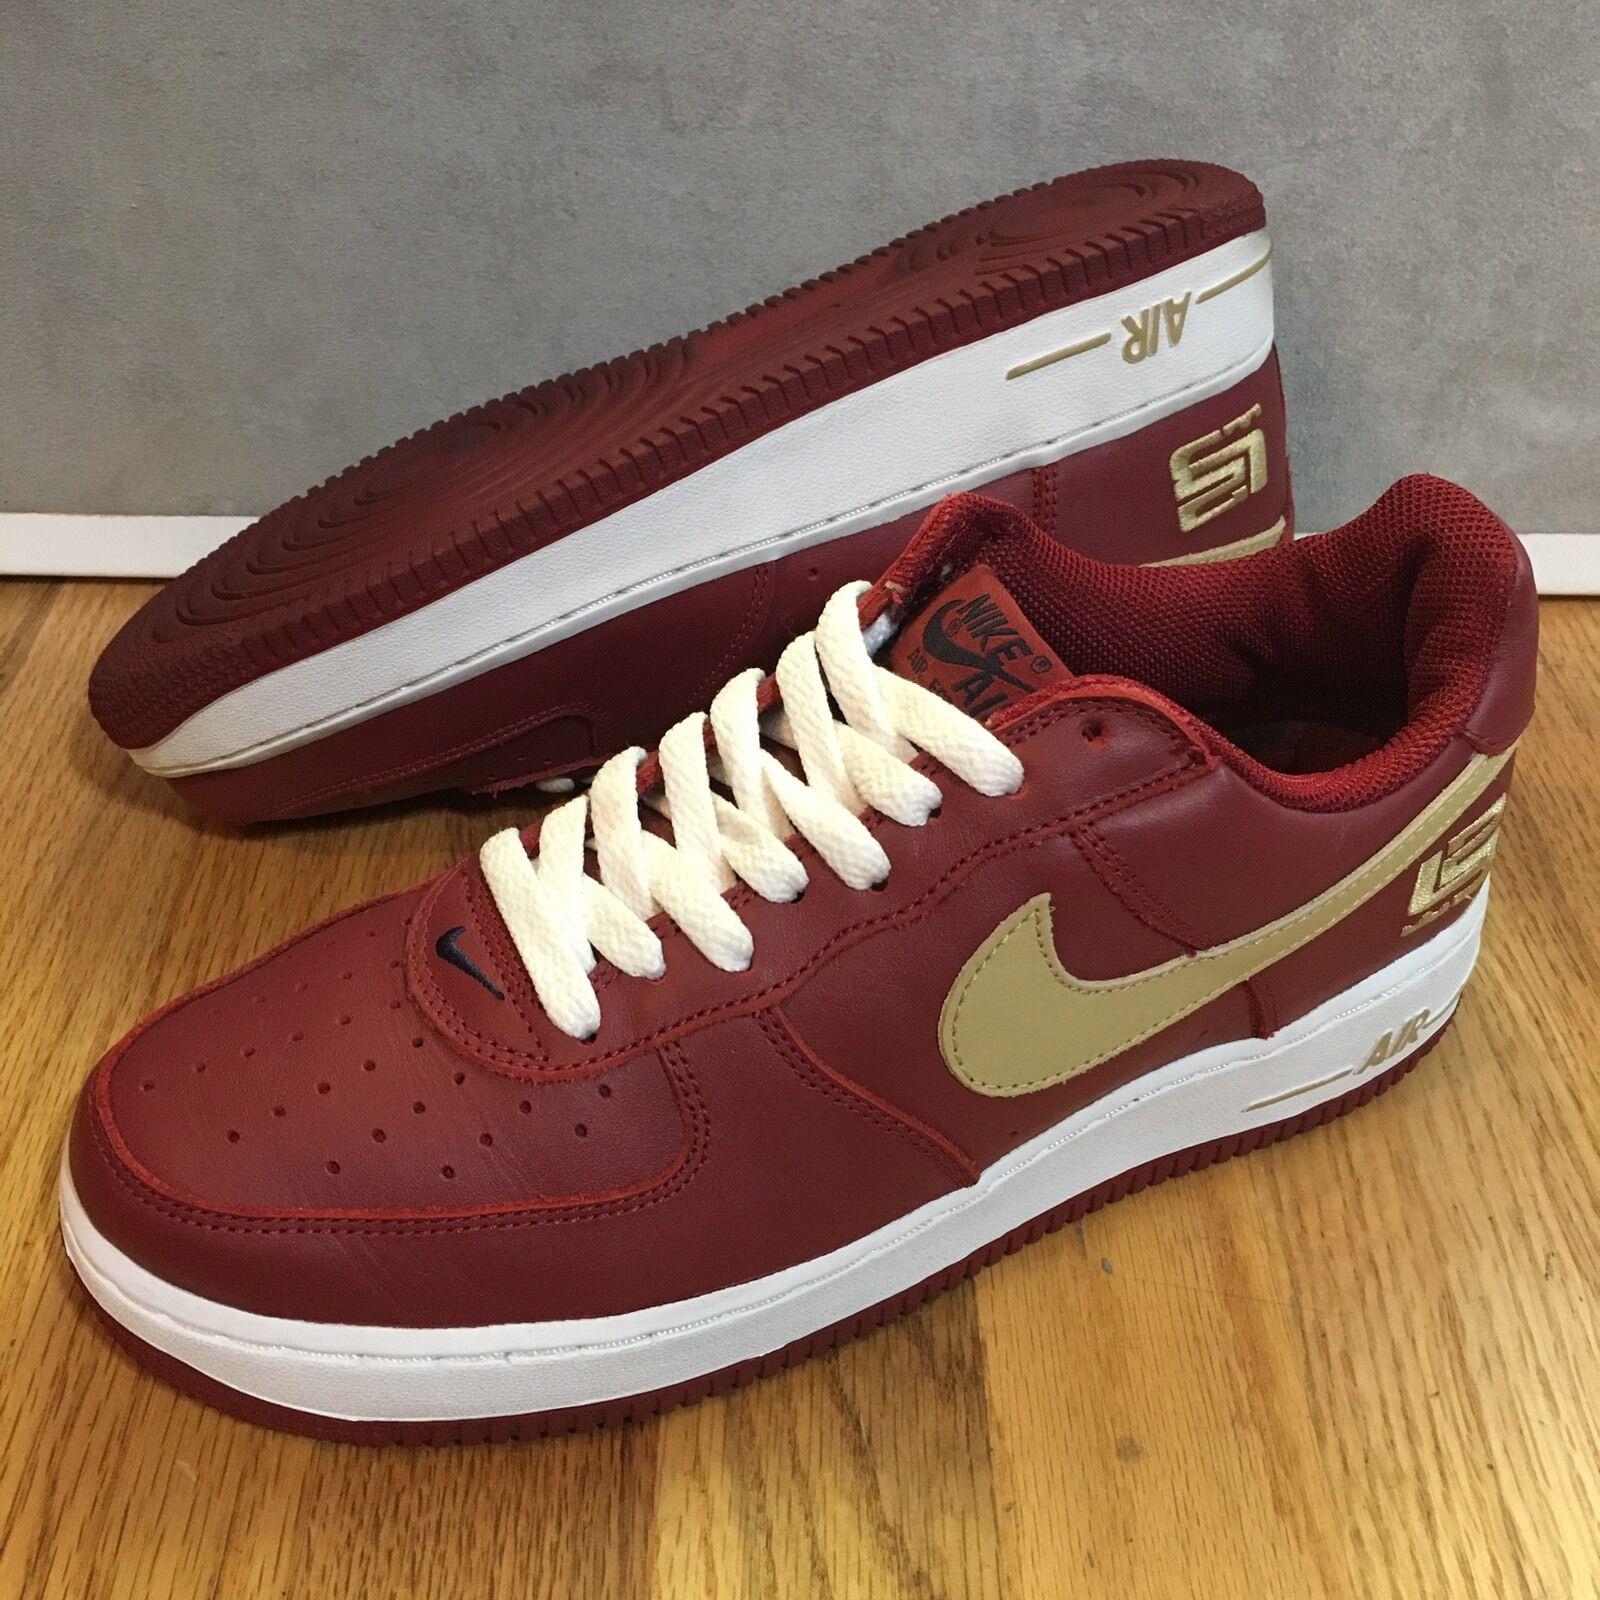 2003 Nike Air Force 1 Low Lebron James Varsity Crimson Gold Men's Shoes Size 8.5